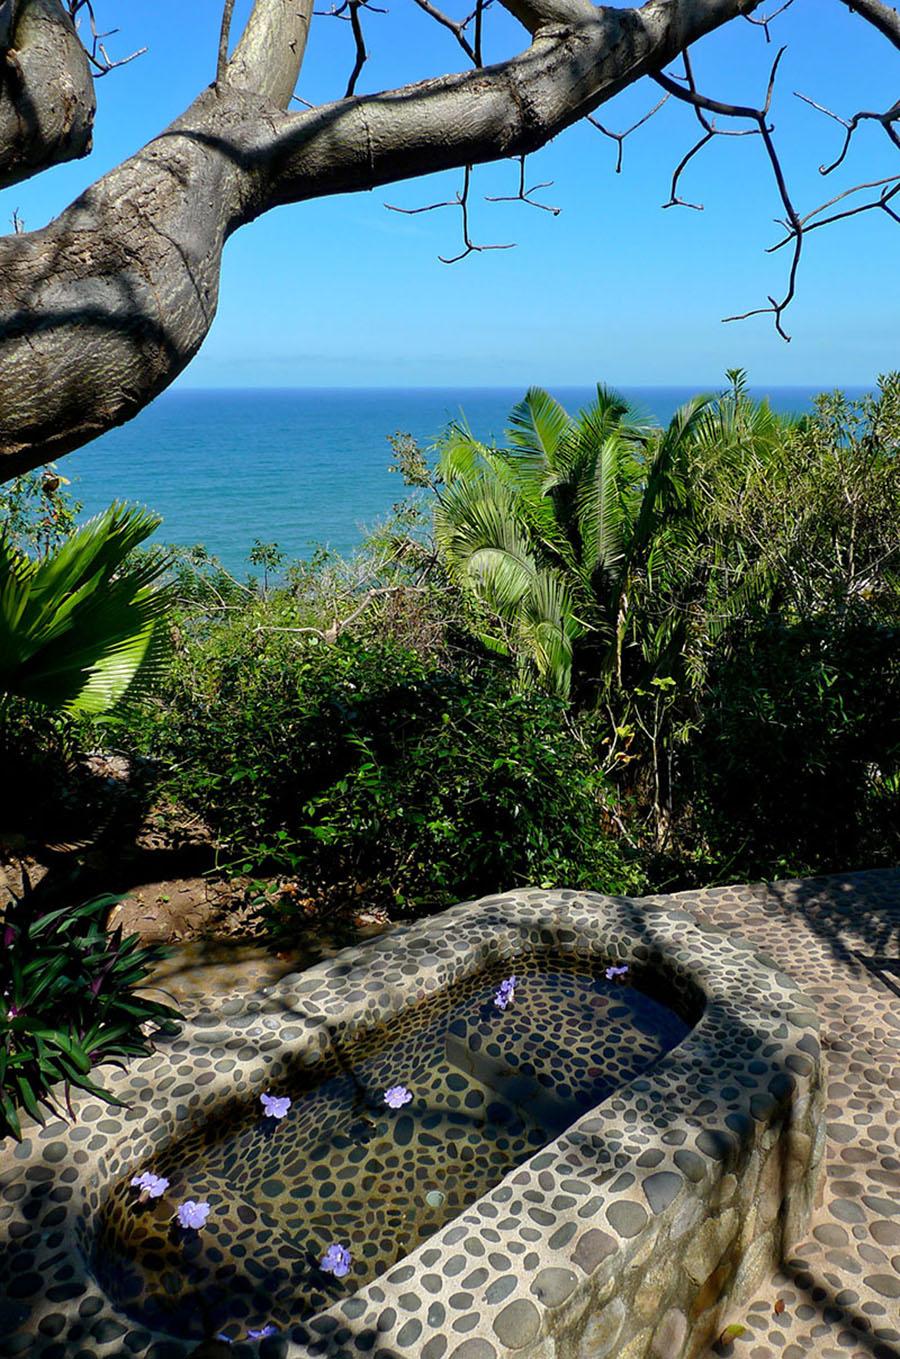 Mar al Cielo Eco-Retreat, Boutique Hotel, Hotel, Accommodations, Lo de Marcos, Nayarit, Riviera Nayarit, Vacation, near Puerto Vallarta, Mexico, Mexican Style, Mexican Architecture, Beautiful view